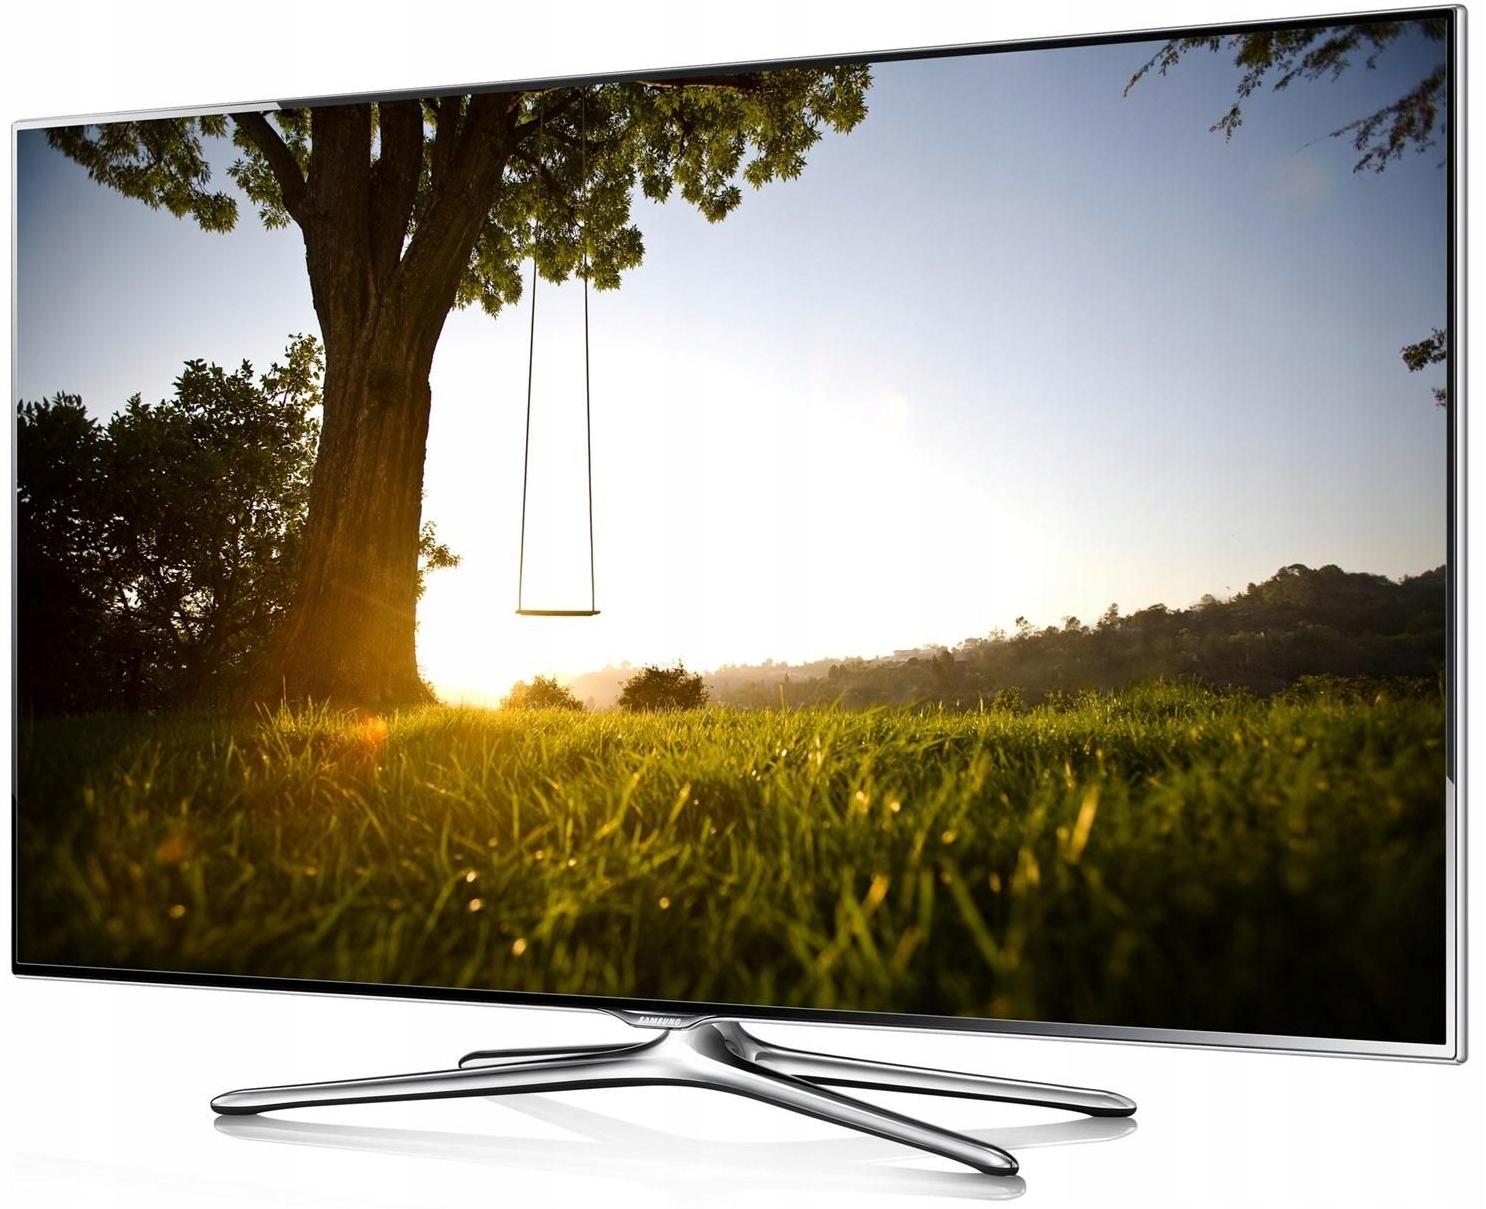 Samsung Smart TV UE55F6500 55'' LED FullHD 3D WiFi